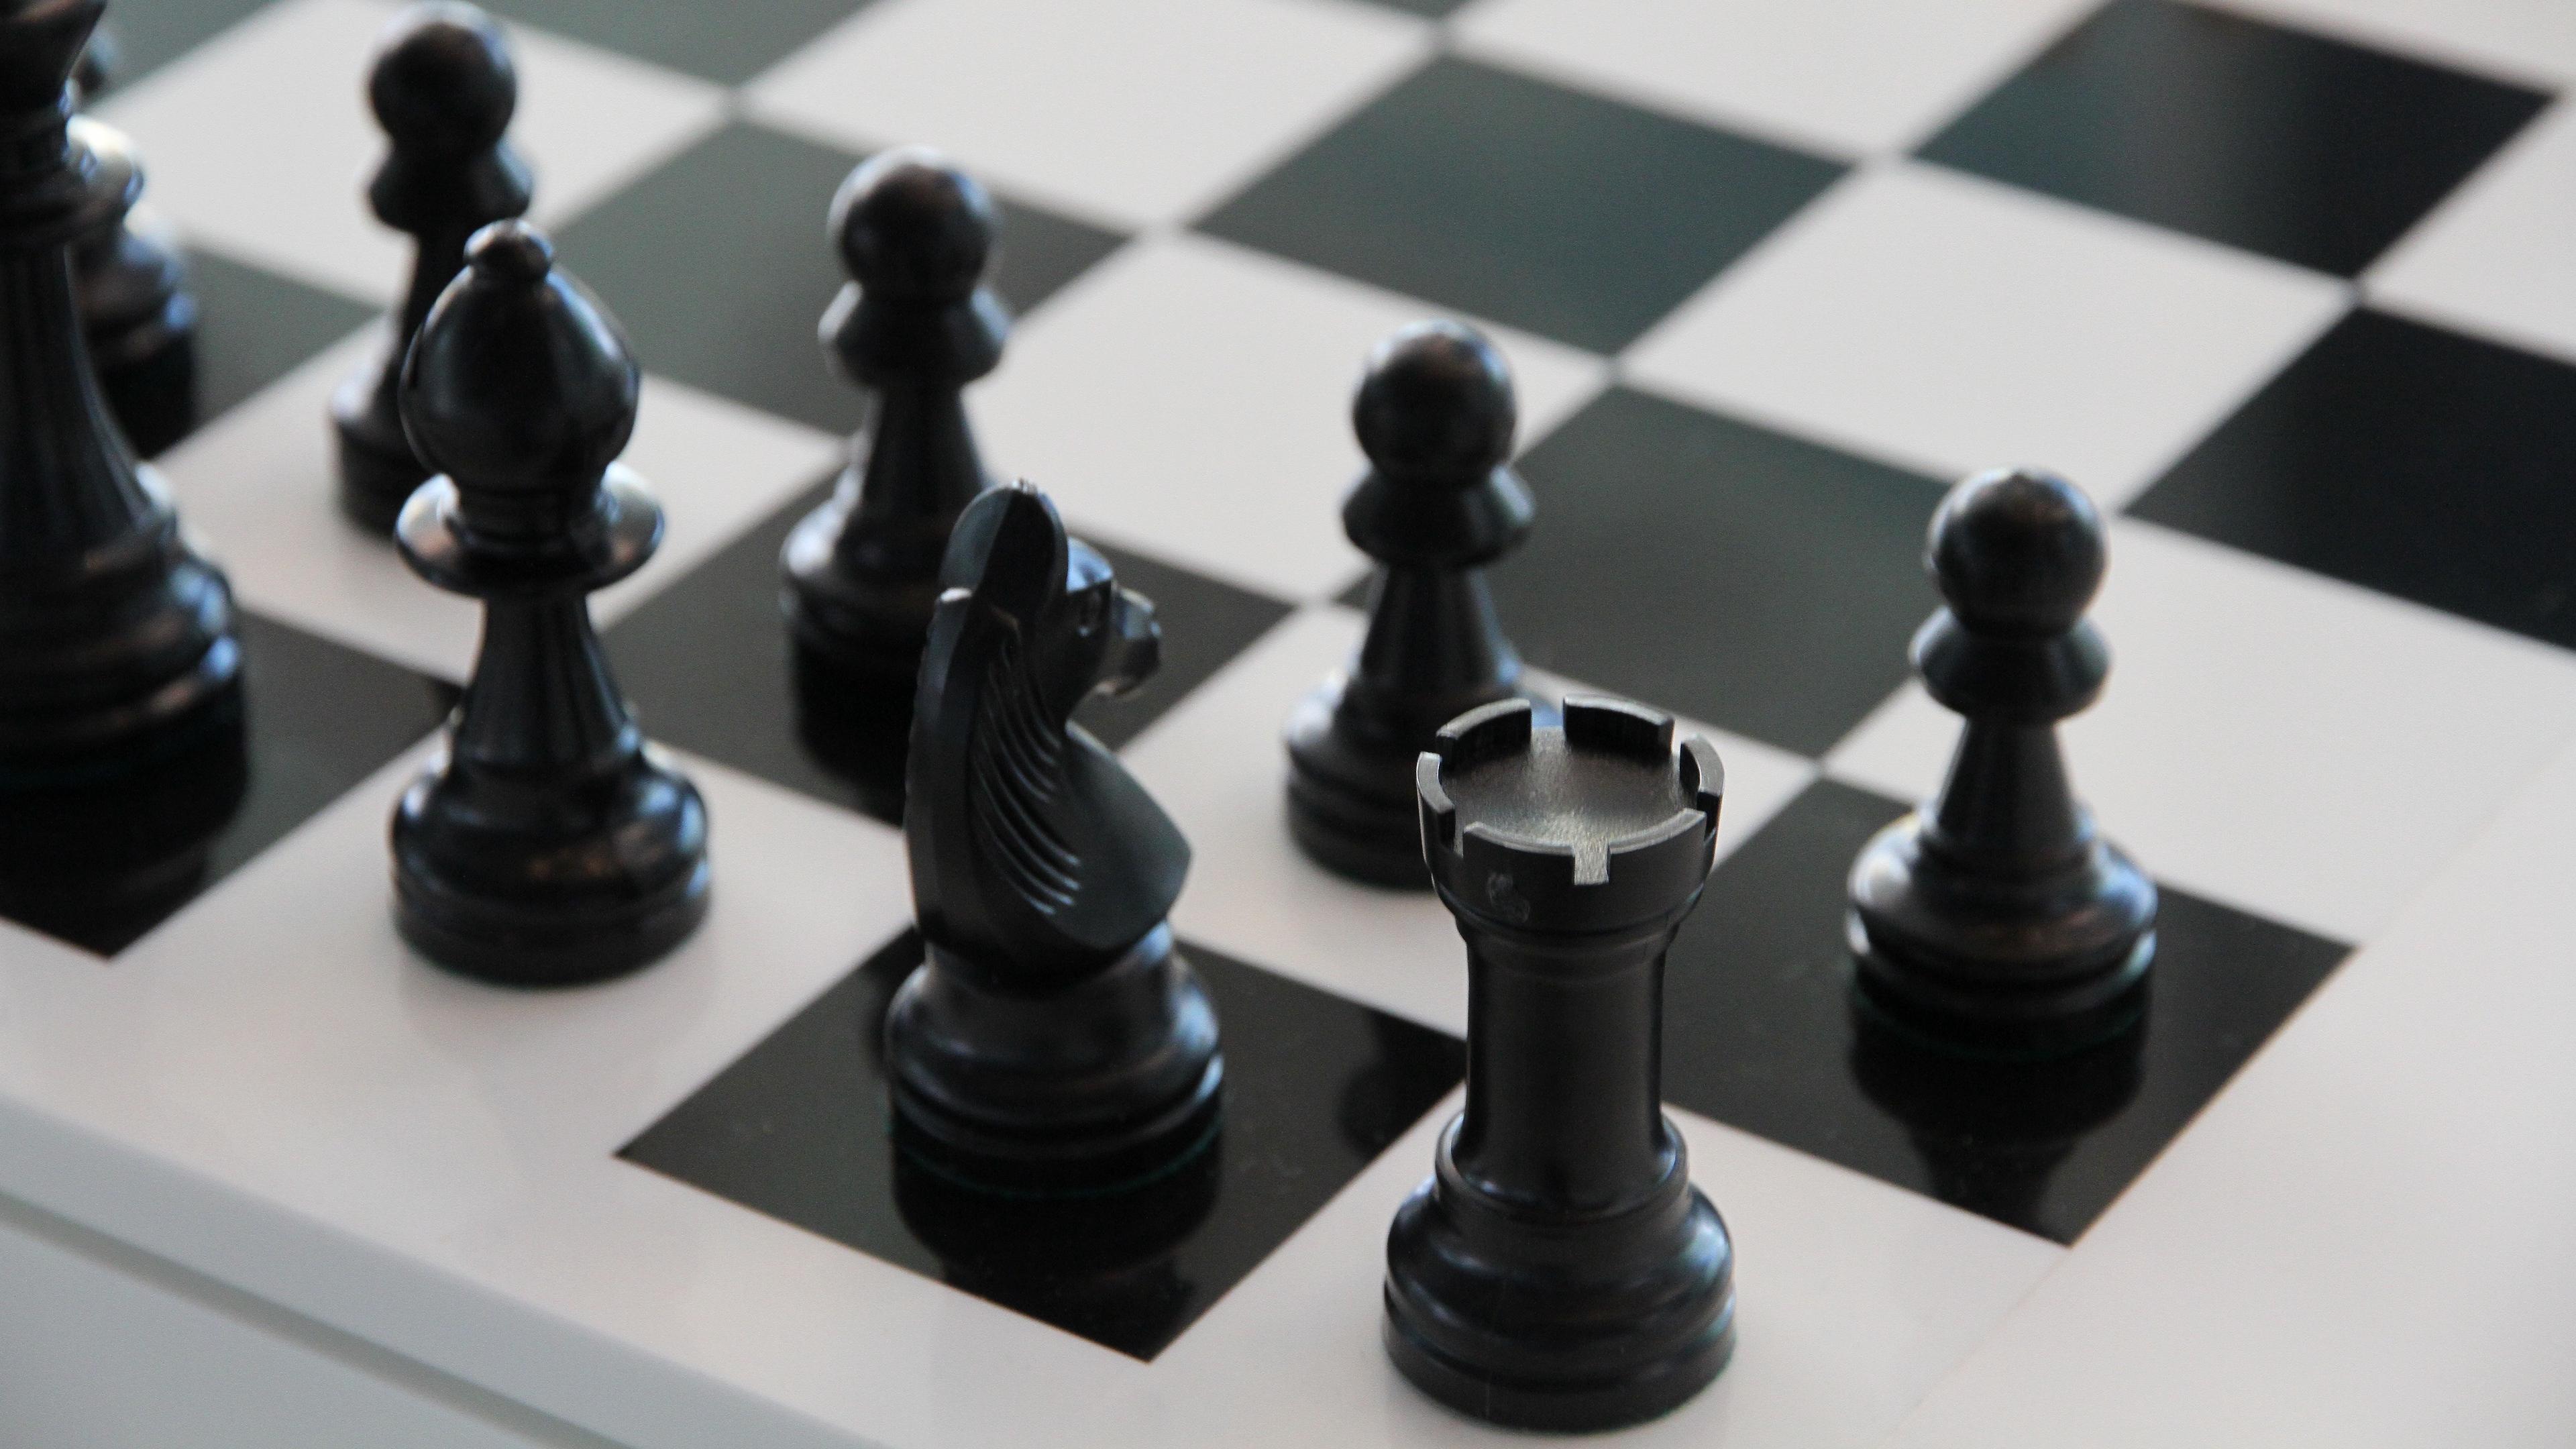 chess chessboard figure bw 4k 1540063189 - chess, chessboard, figure, bw 4k - Figure, chessboard, Chess